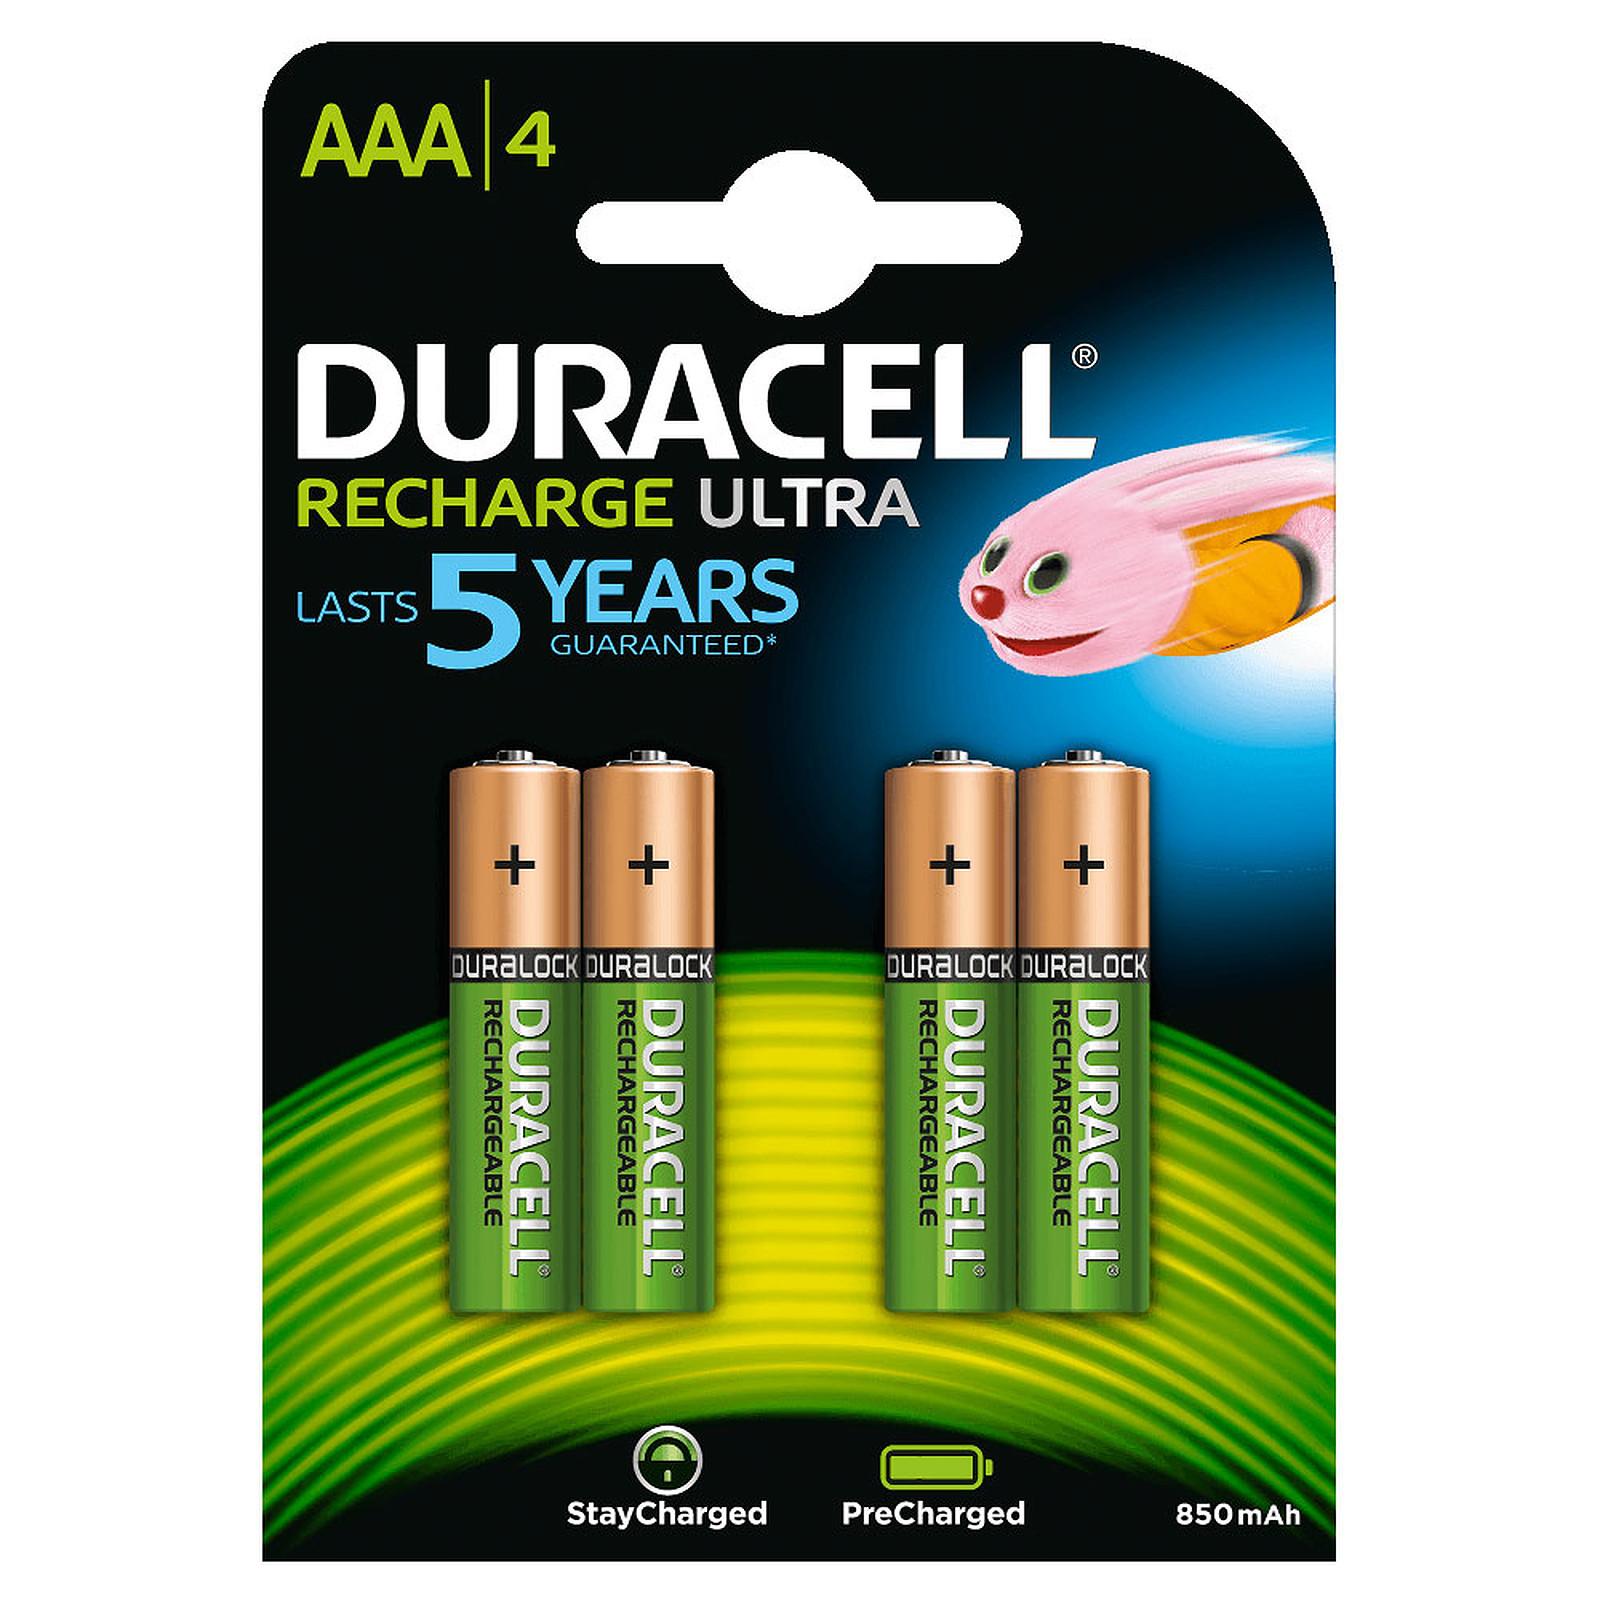 Duracell Recharge Ultra AAA 850 mAh (par 4)